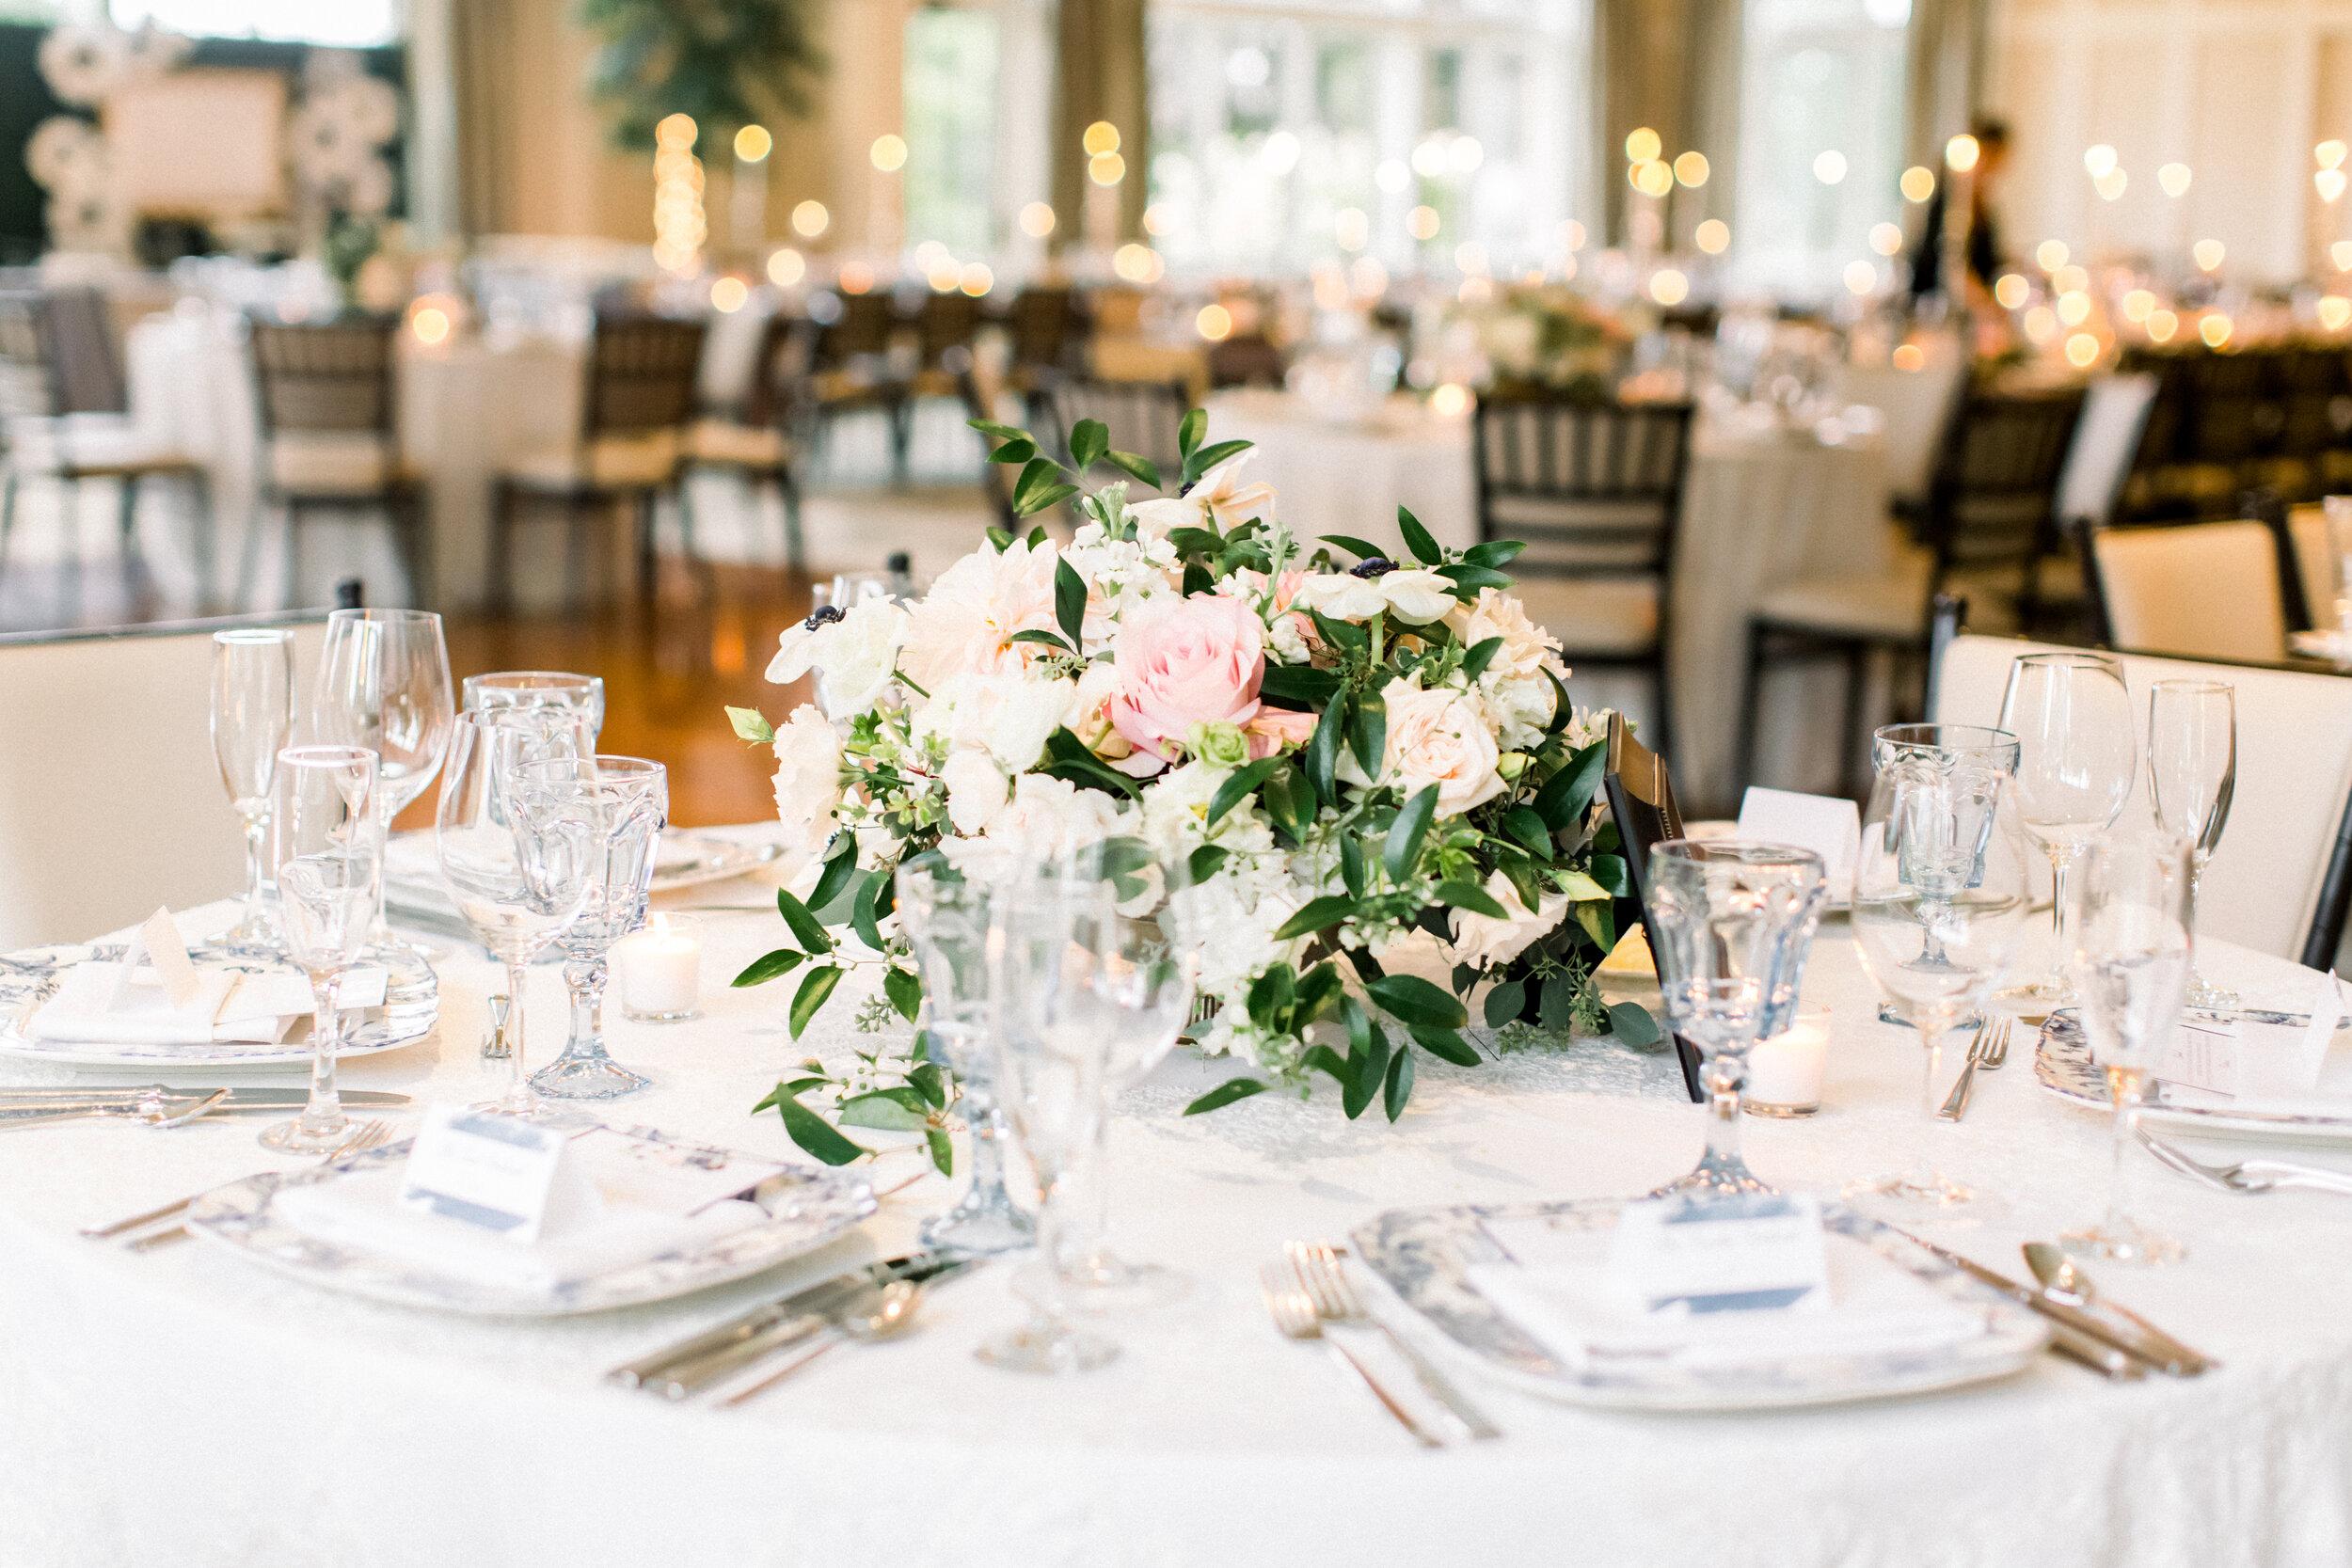 Kuiper+Wedding+Reception+Details-44.jpg